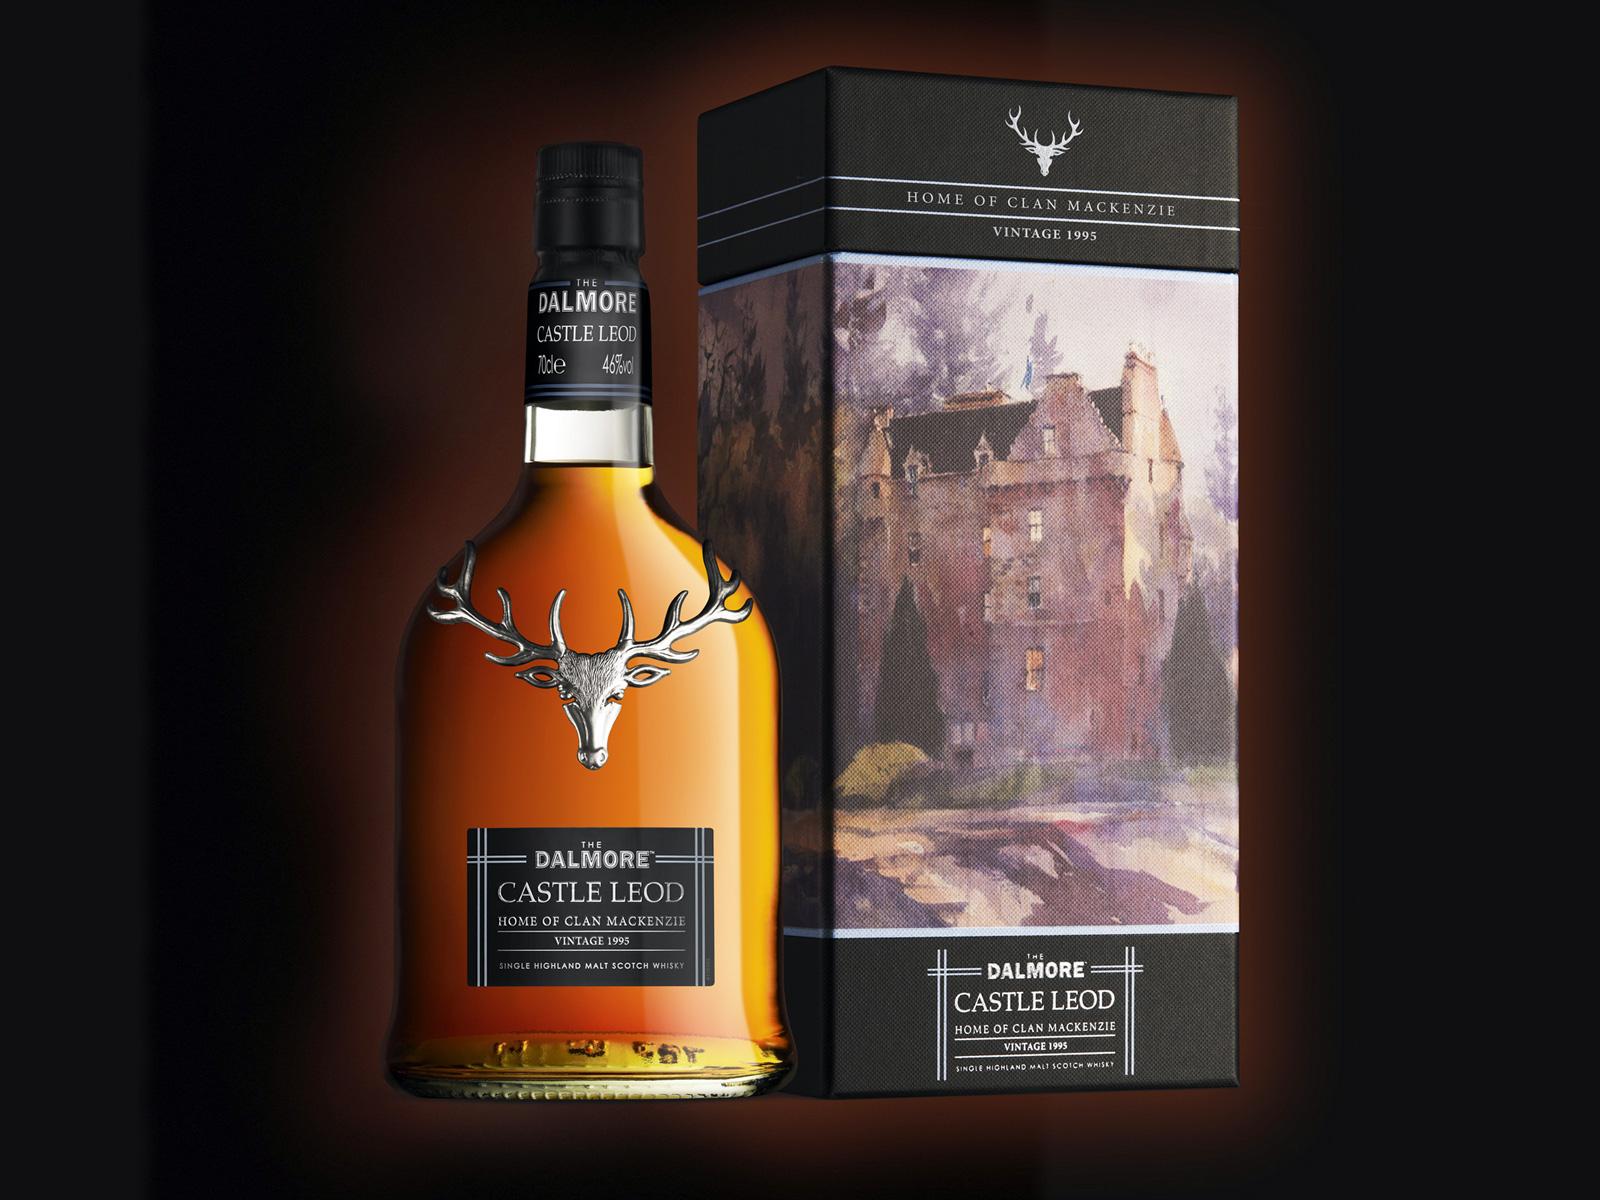 The Dalmore Castle Leod Whisky